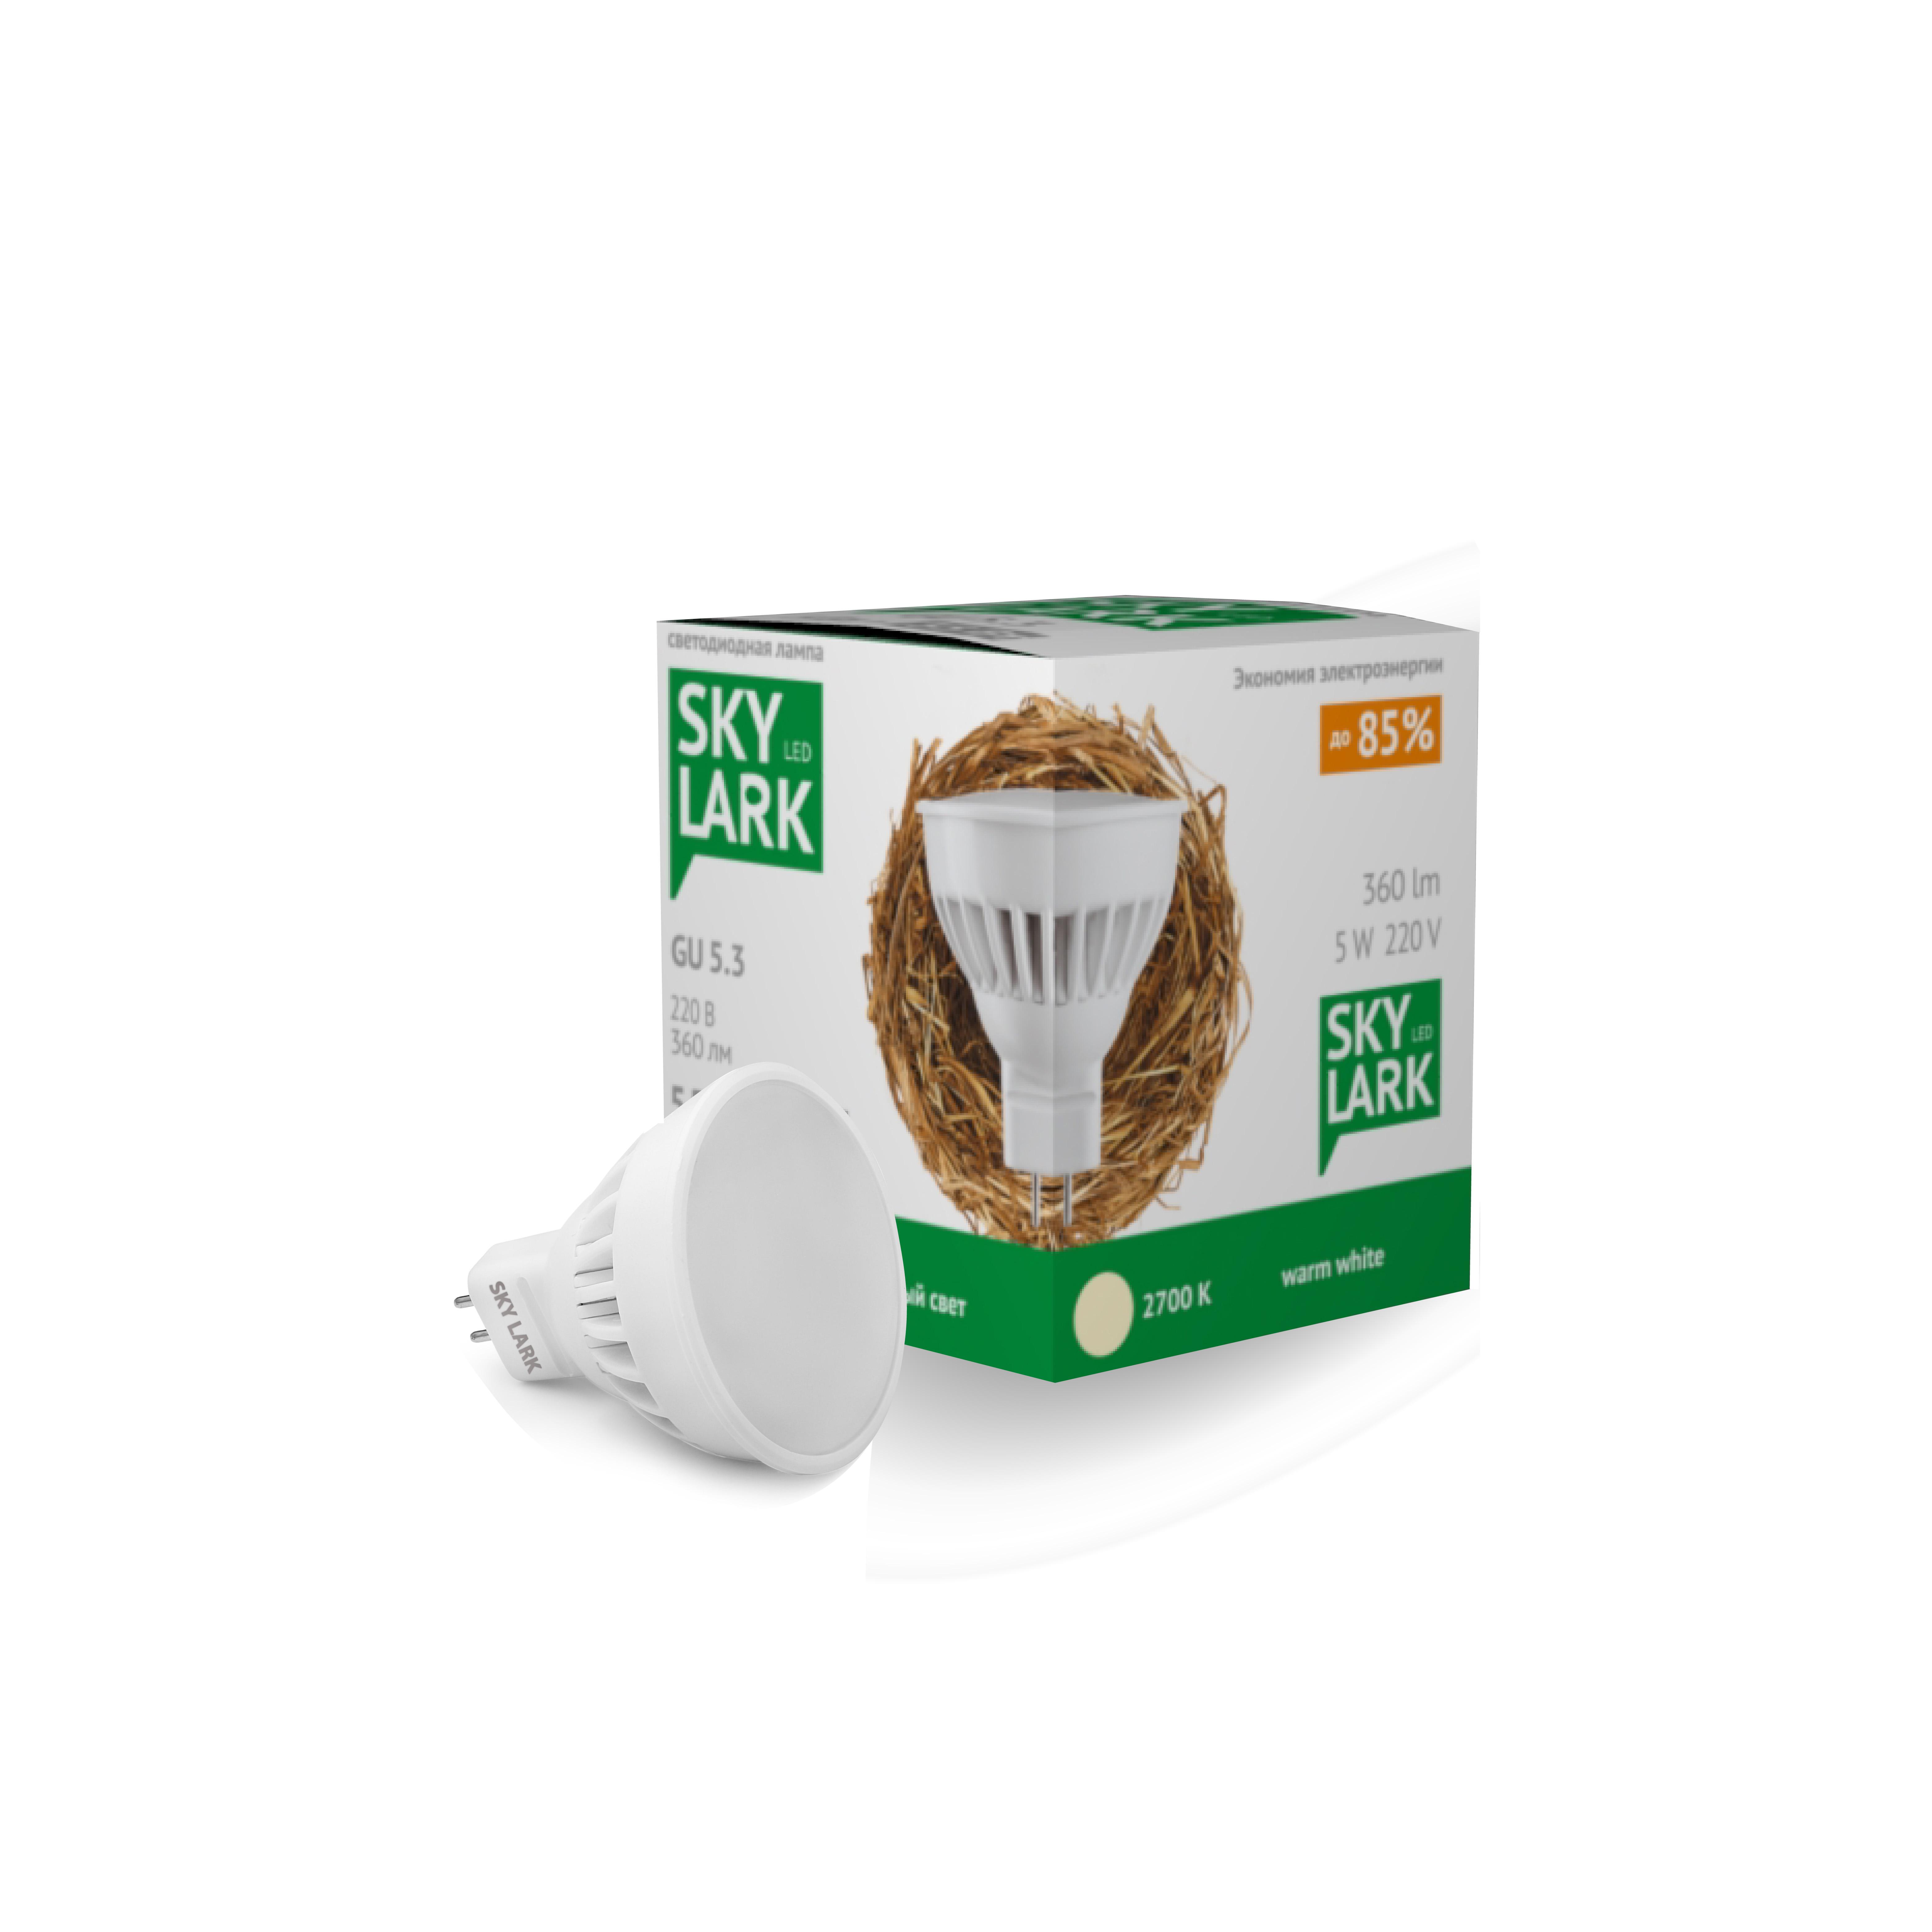 Лампа светодиодная Skylark B021 skylark светодиодная лампа skylark gu5 3 5w 3500k рефлекторная матовая b030